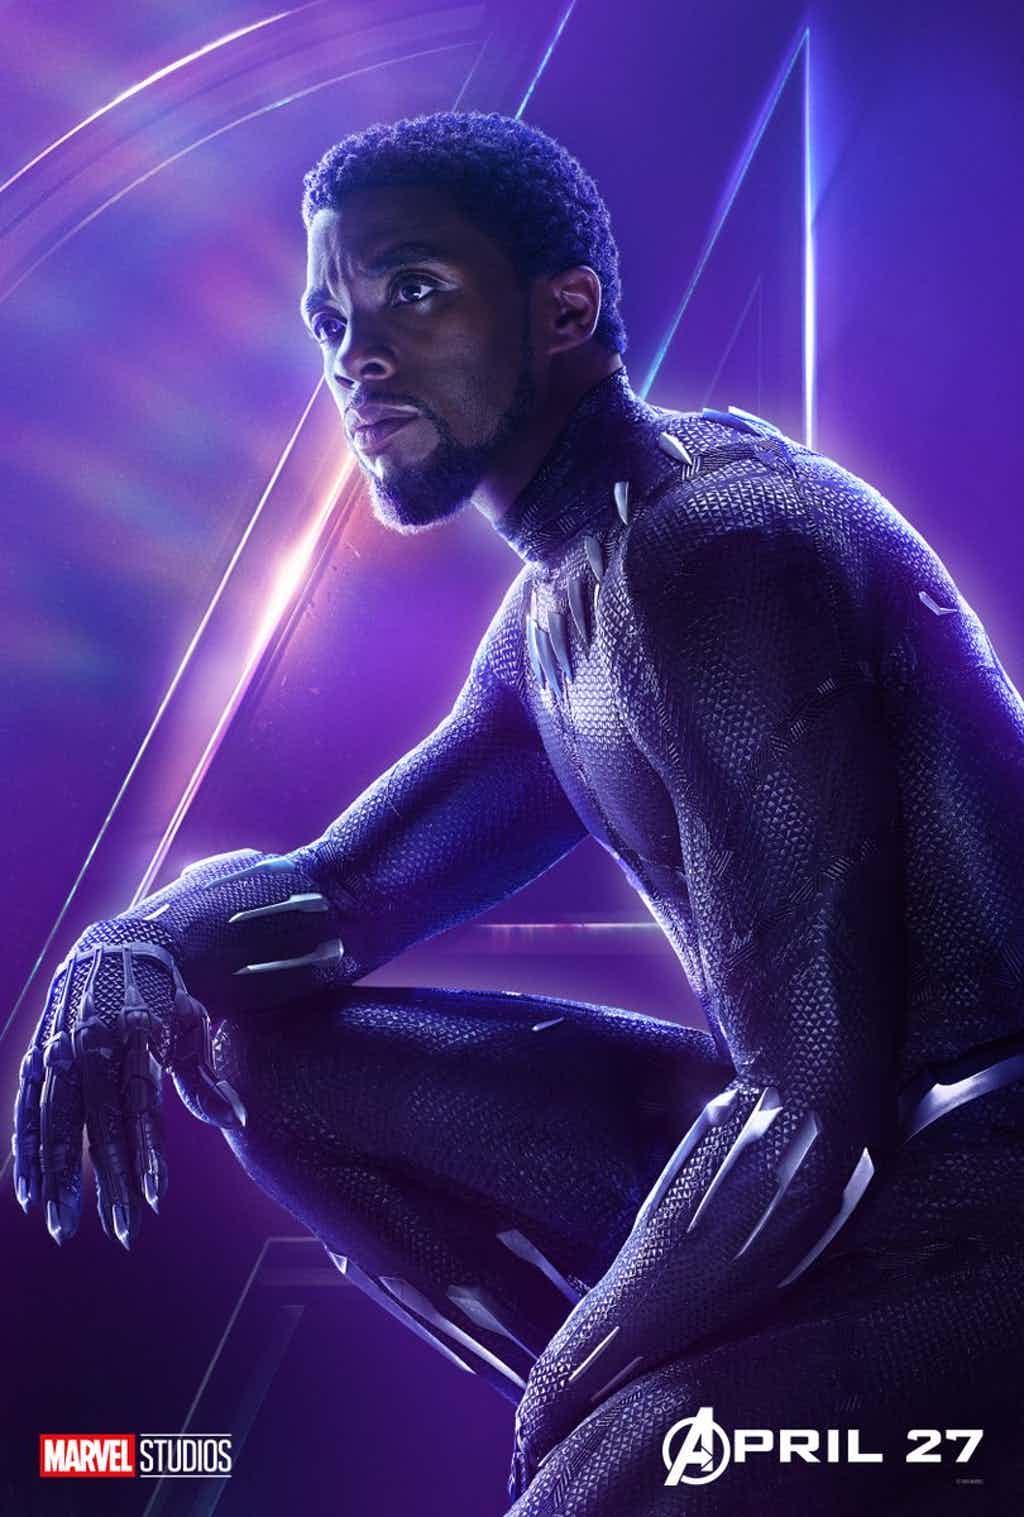 szmk_marvel_infinity_war_vegtelen_haboru_bosszuallok_avengers_ironman_hulk_thor_captainamaerica_guardians_galaxy_1.jpg